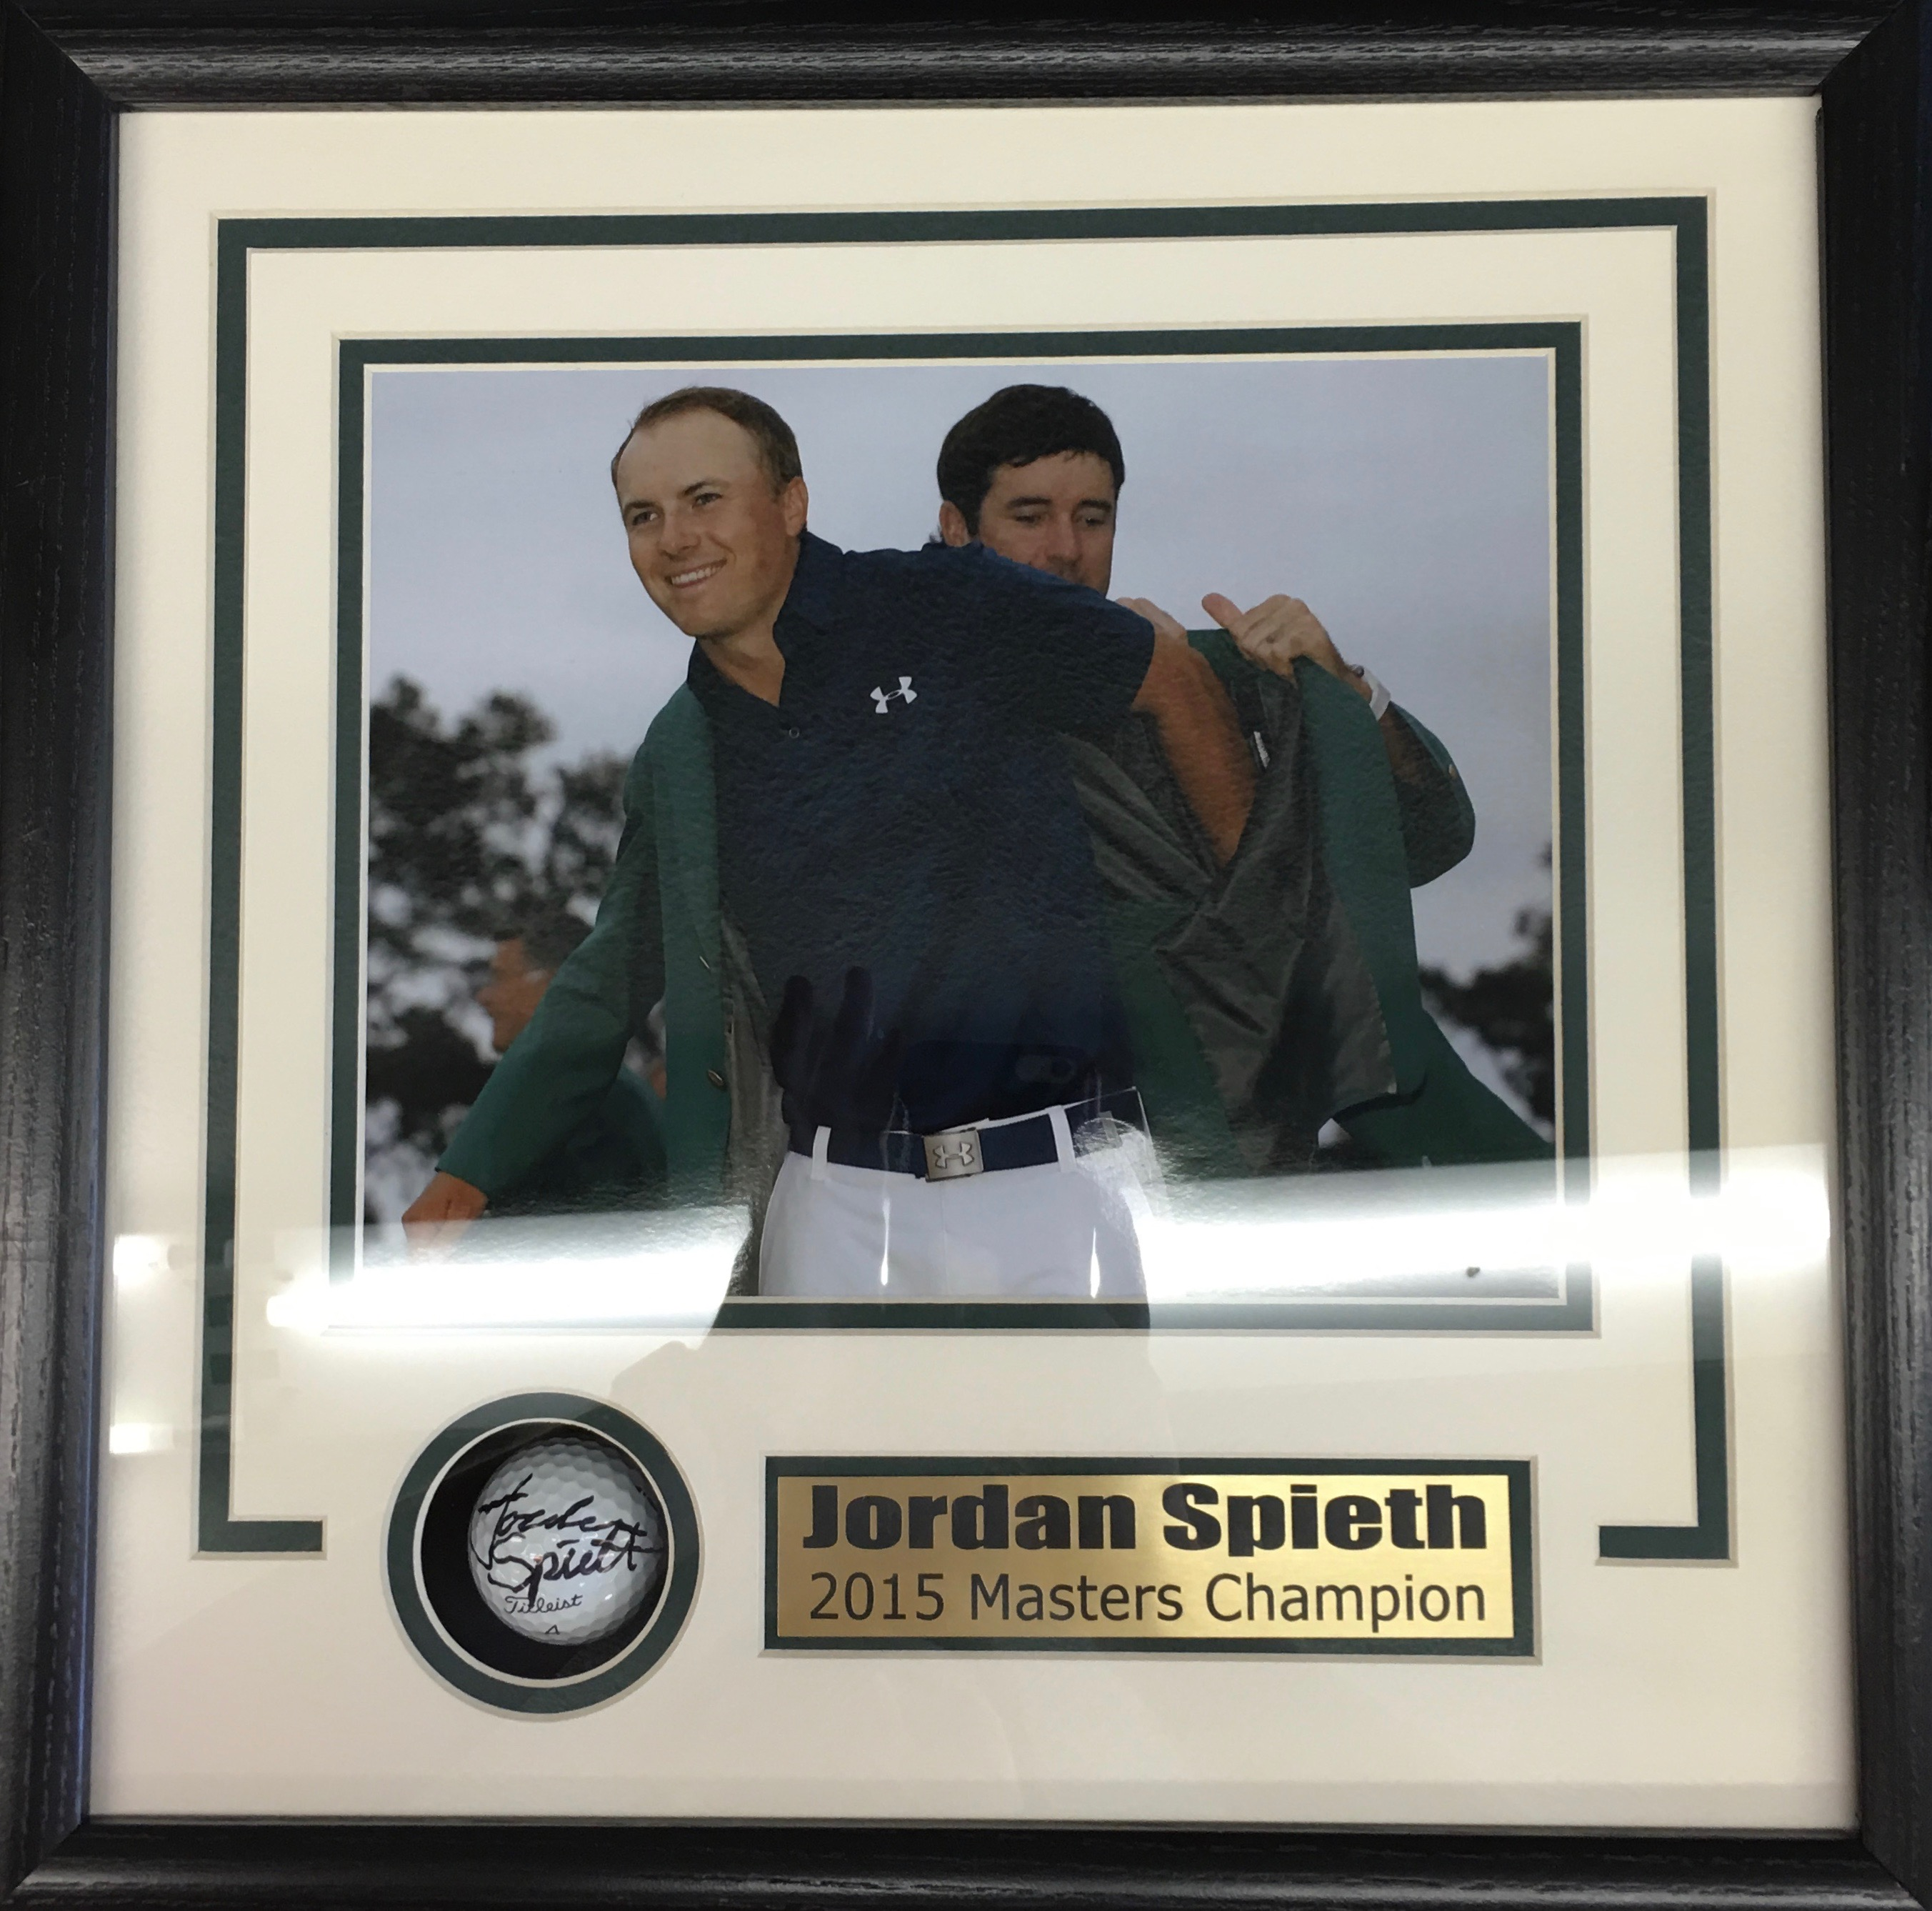 Jordan Speith signed golf ball shadowbox